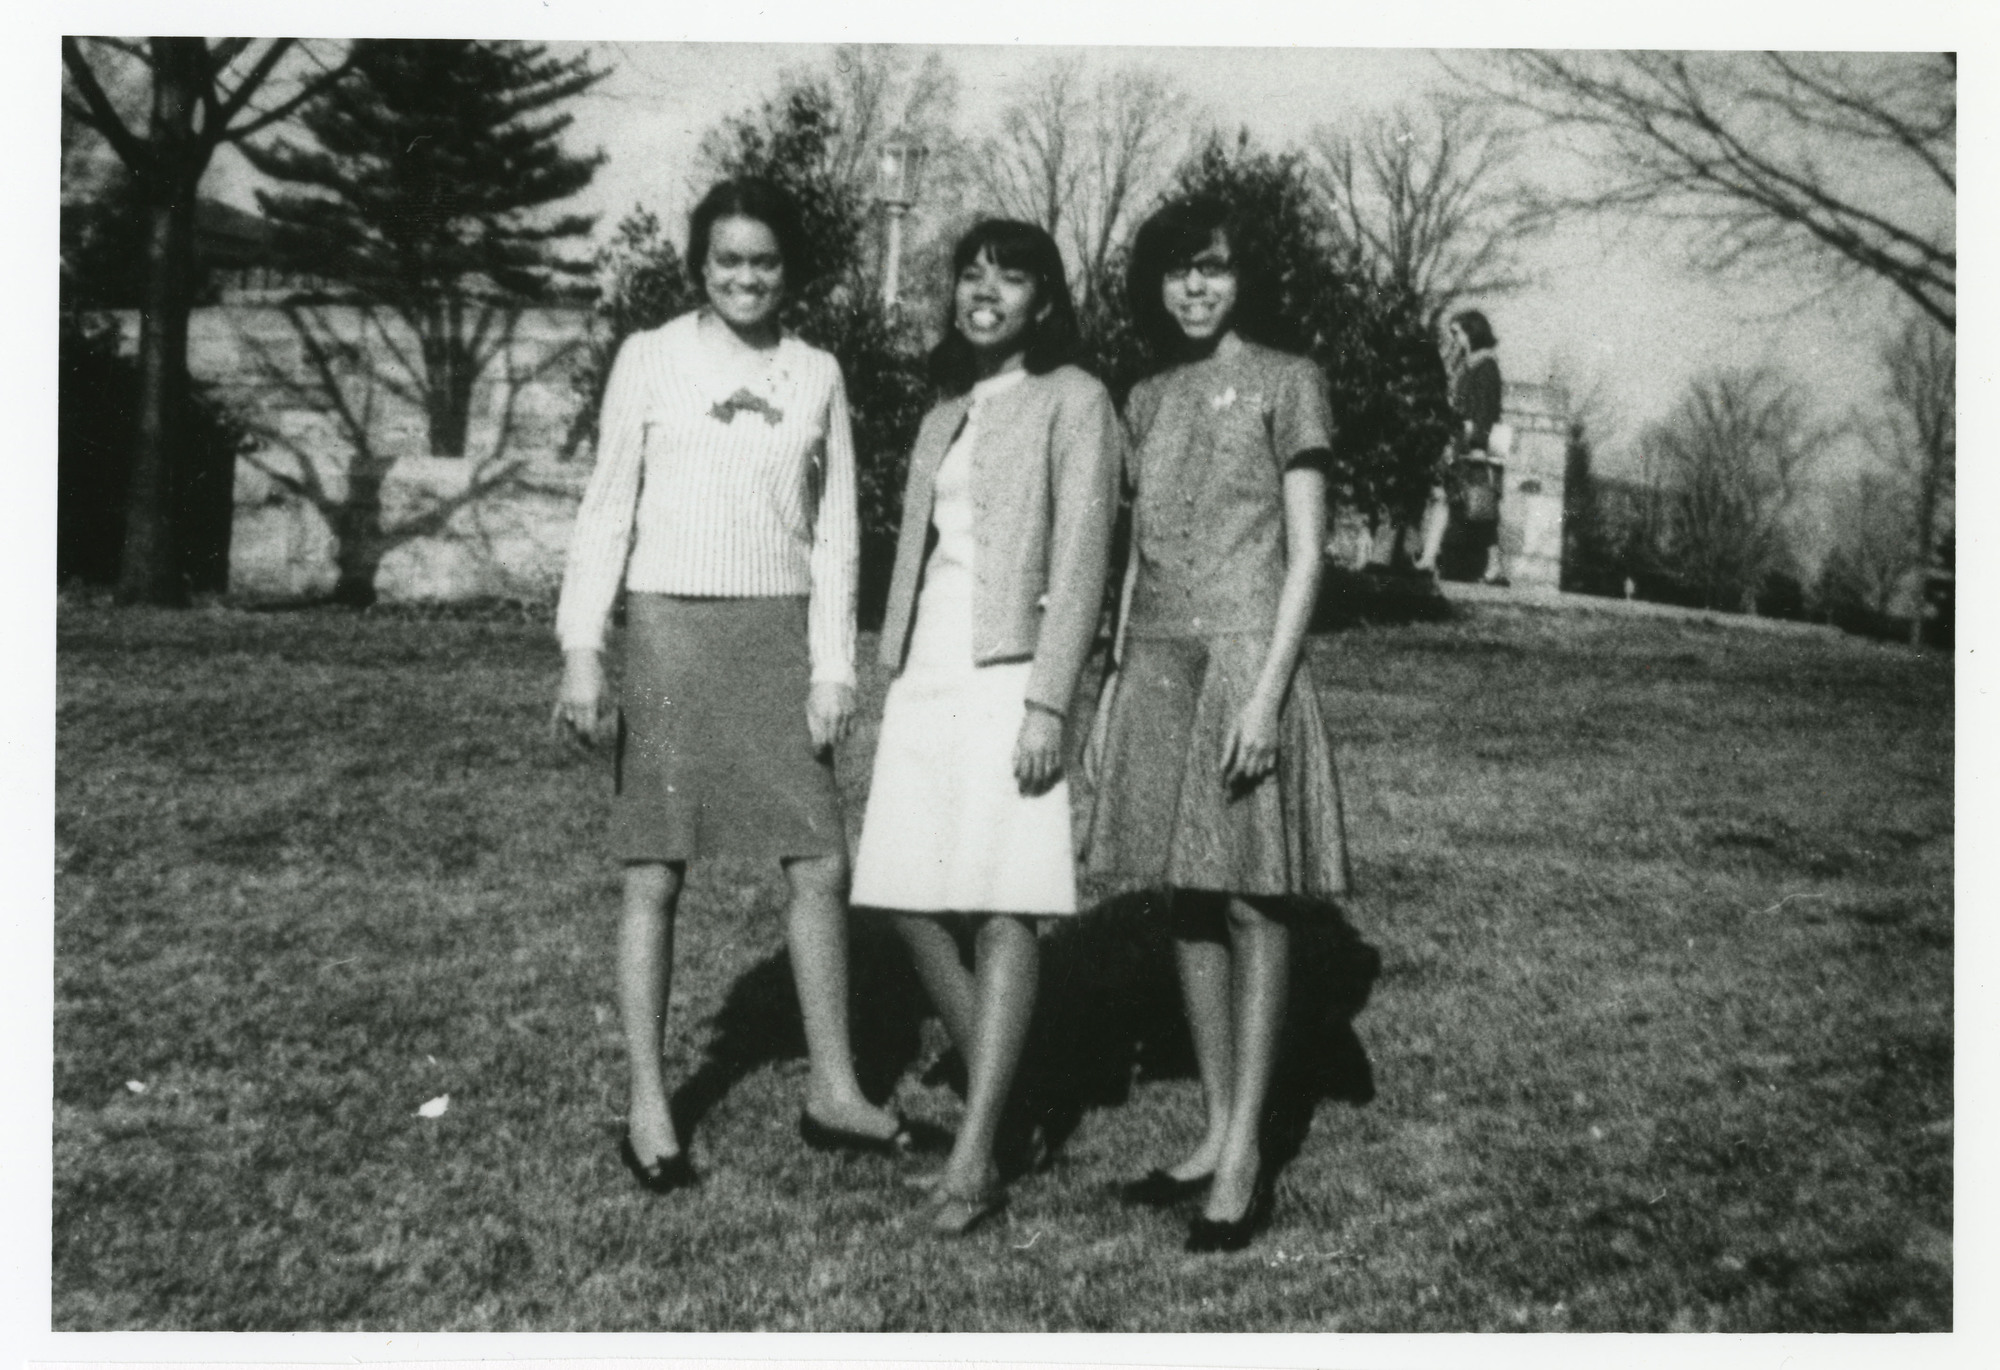 http://spec.lib.vt.edu/pickup/Omeka_upload/ChiquitaHudsonMargueriteHarperandLindaAdams_1966.jpg